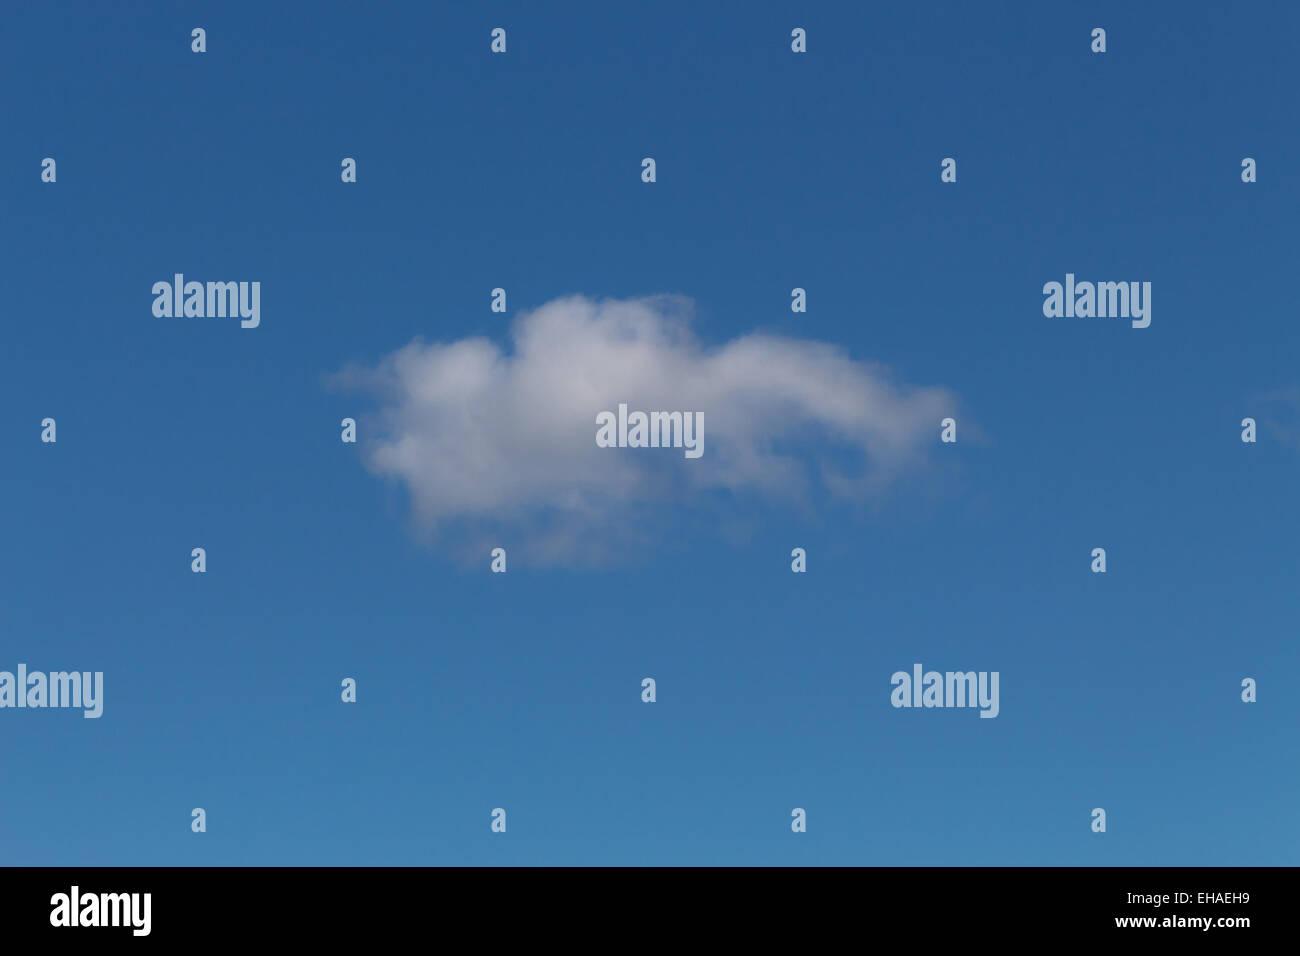 single cloud int the sky - Stock Image